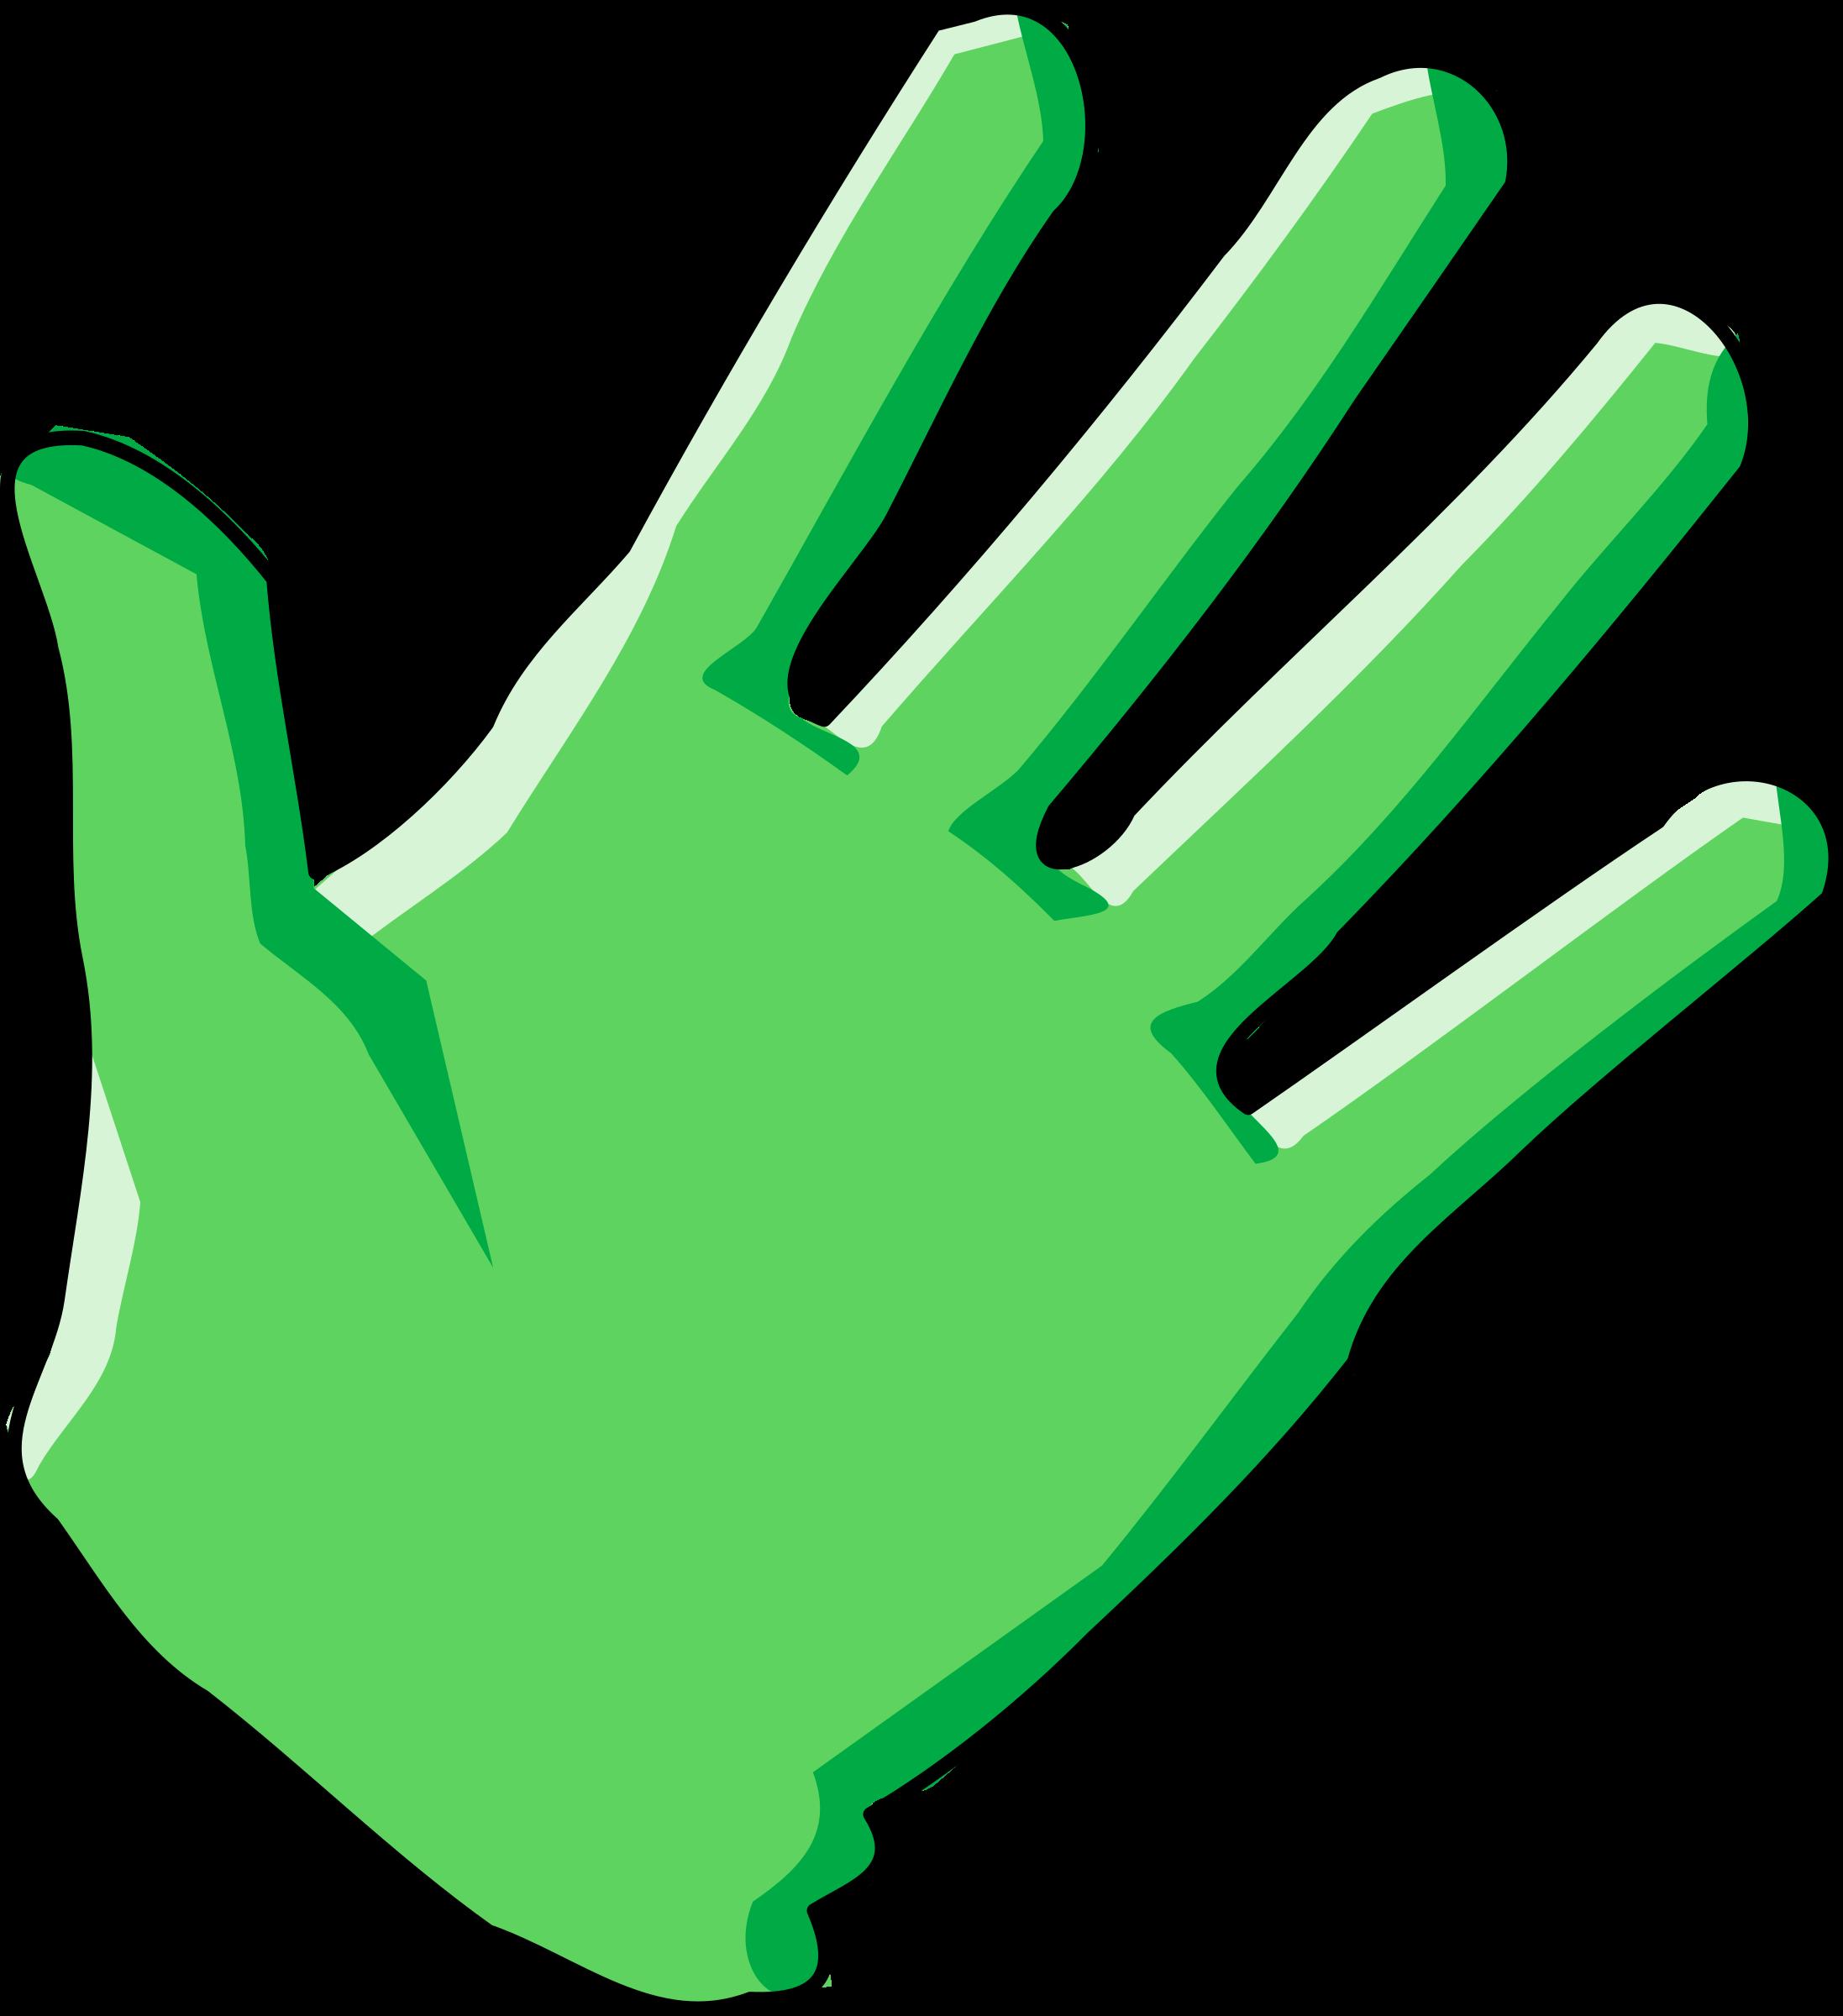 ... Glove clipart ...-... Glove clipart ...-9